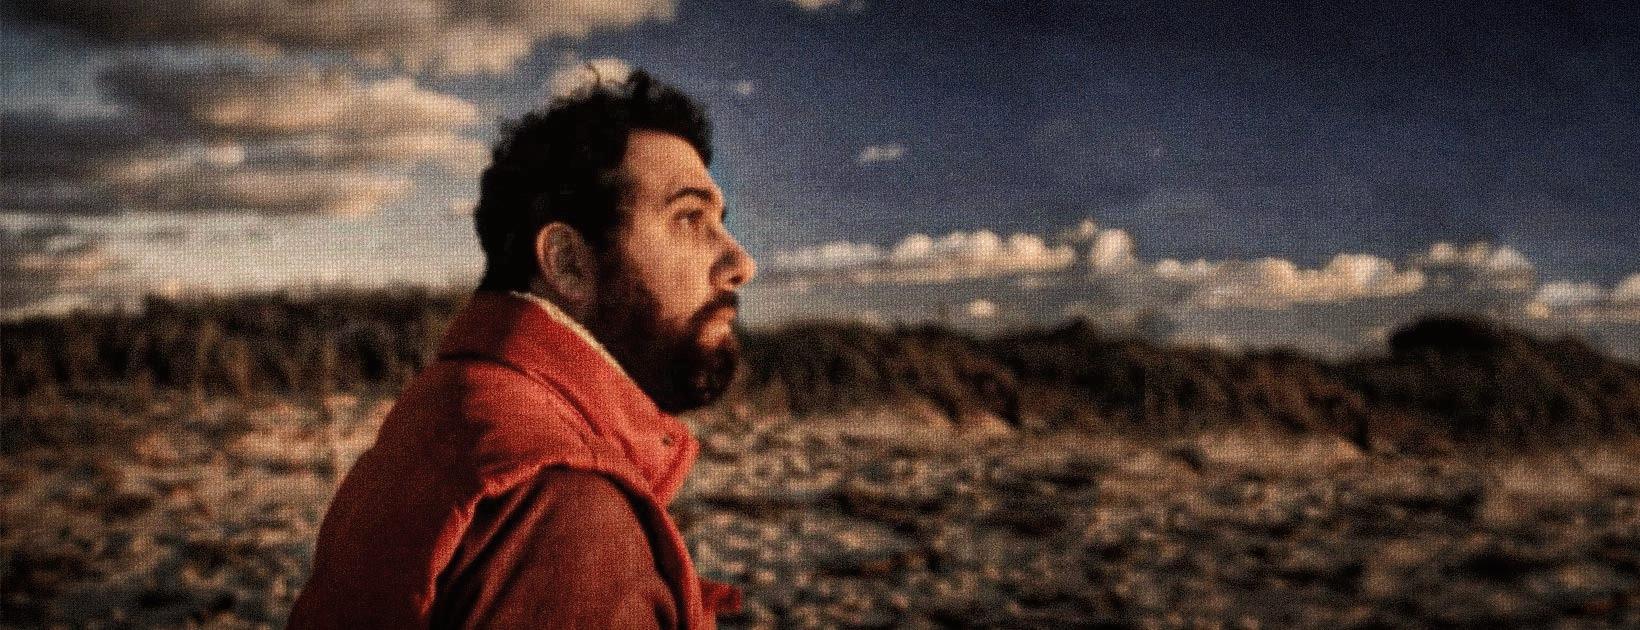 Adam Monaco, Folk Musician.